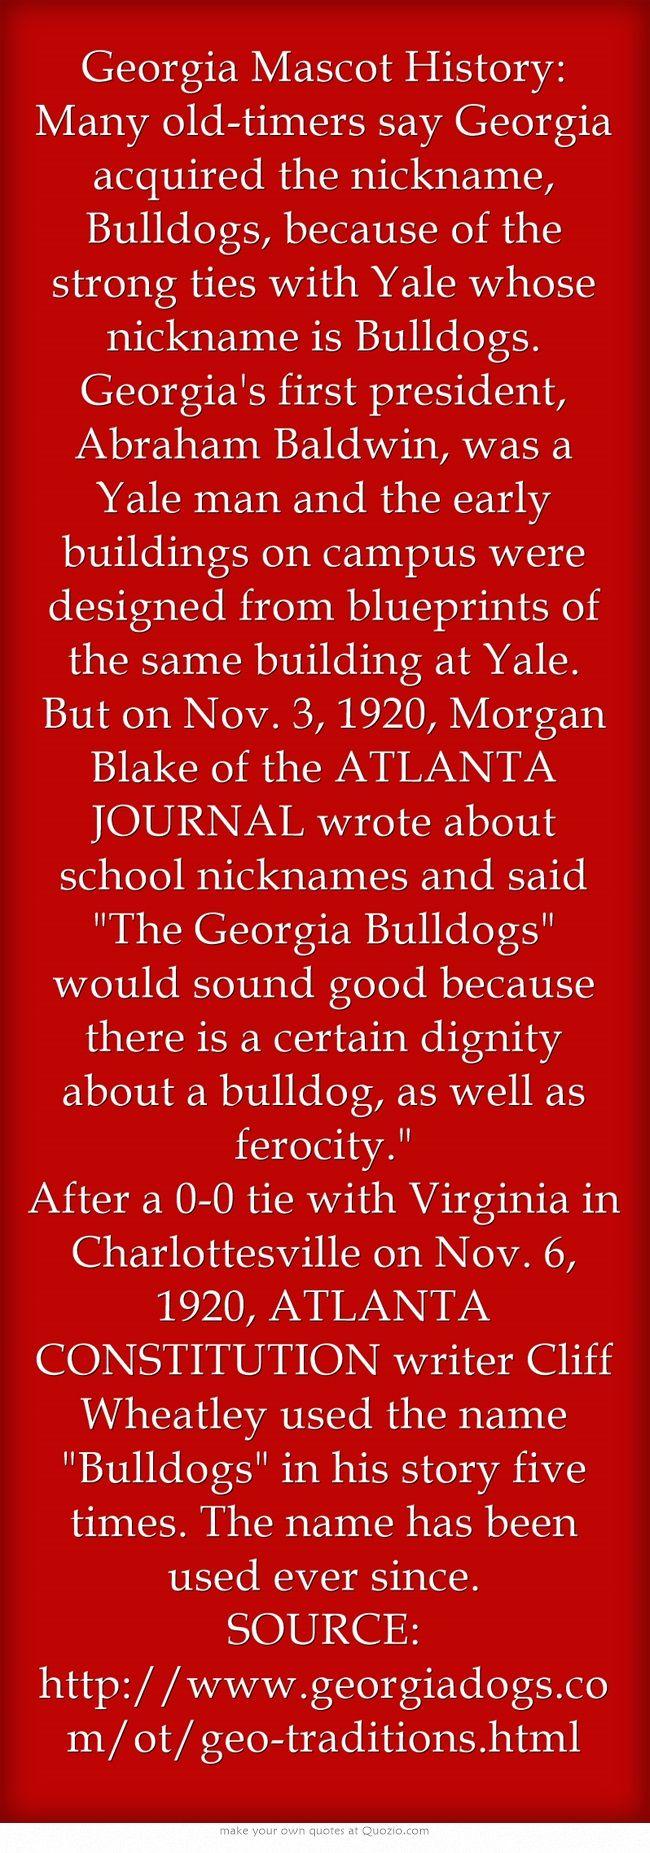 Georgia Mascot History: